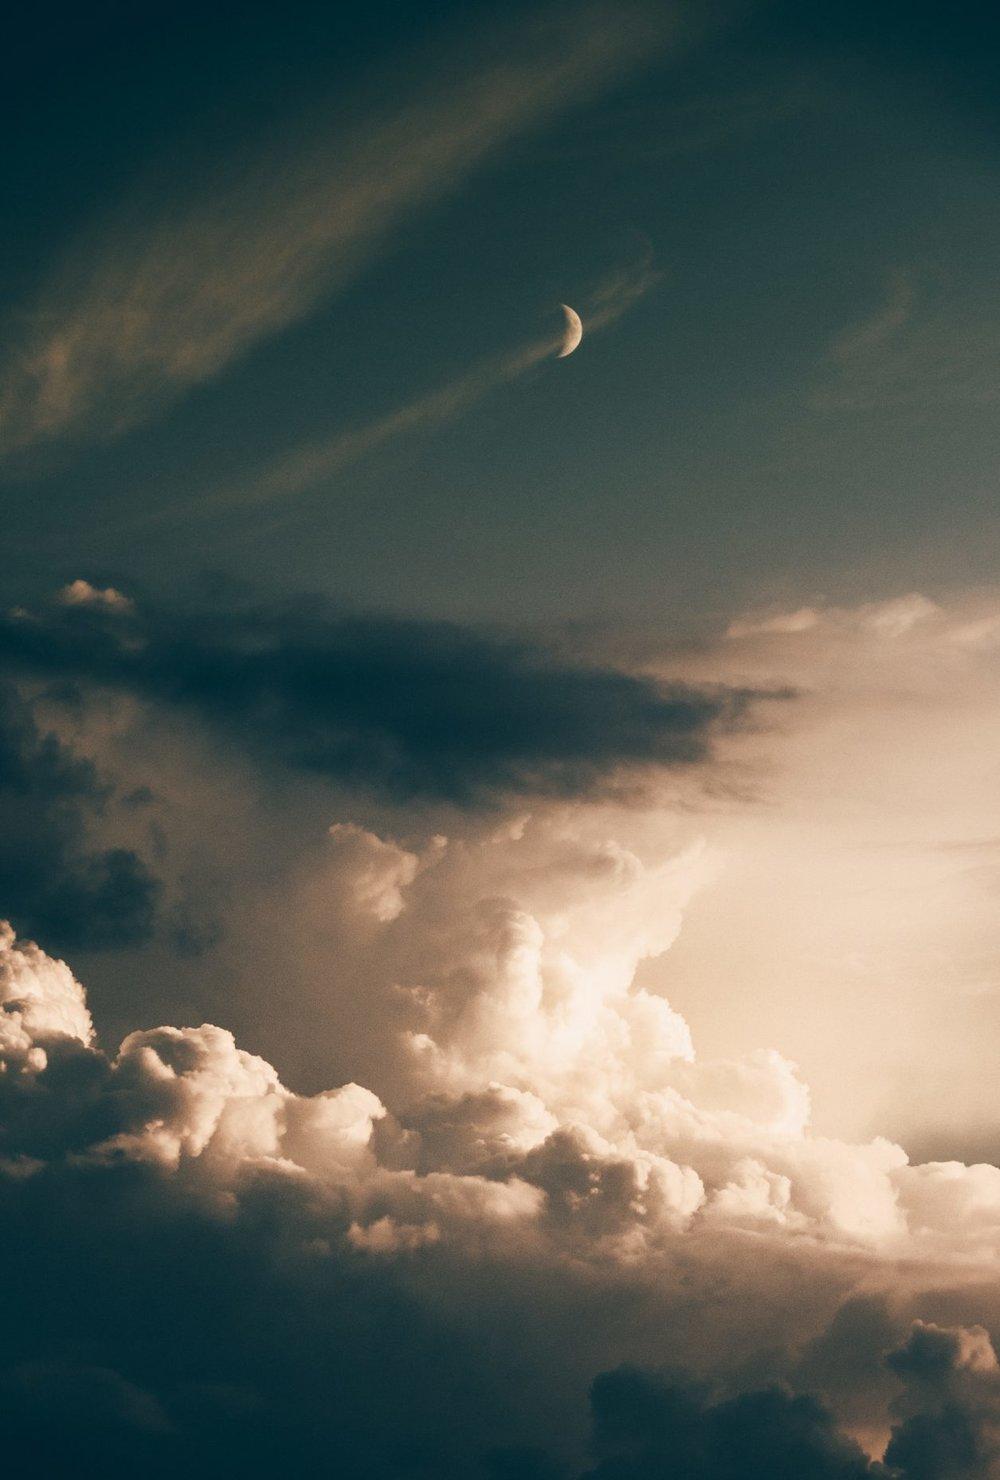 Rising-Woman-New-Moon-in-Scorpio-Astrology-1255x1857.jpg